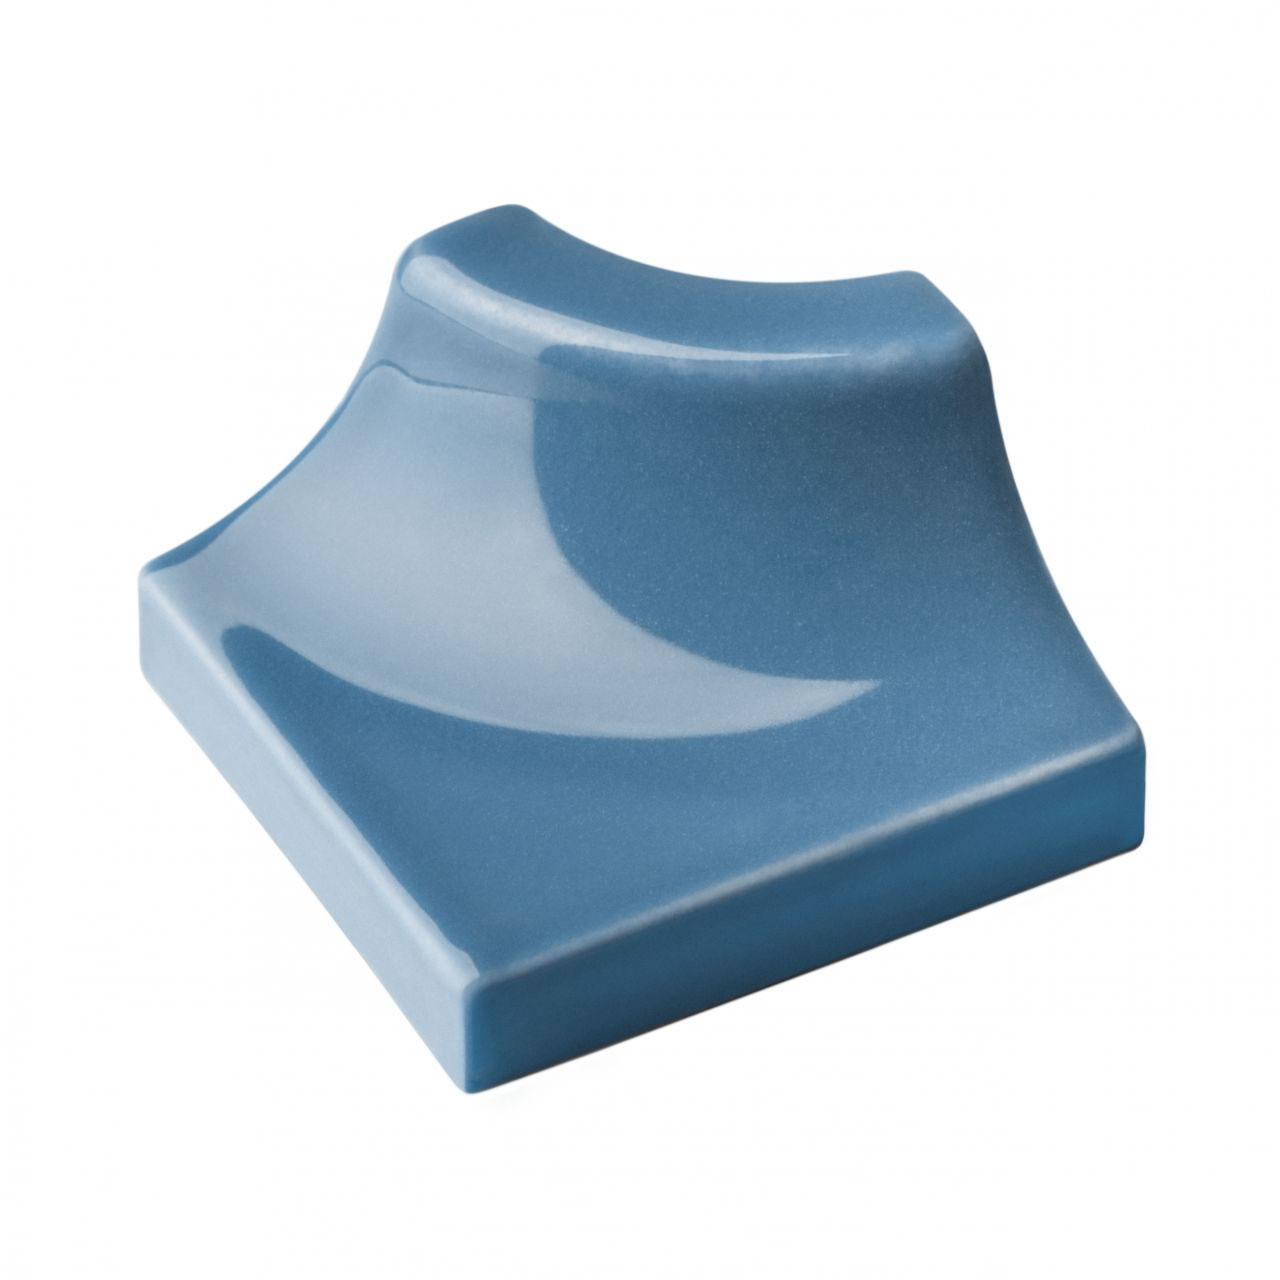 noronha safira canto i br 2,5×2,5